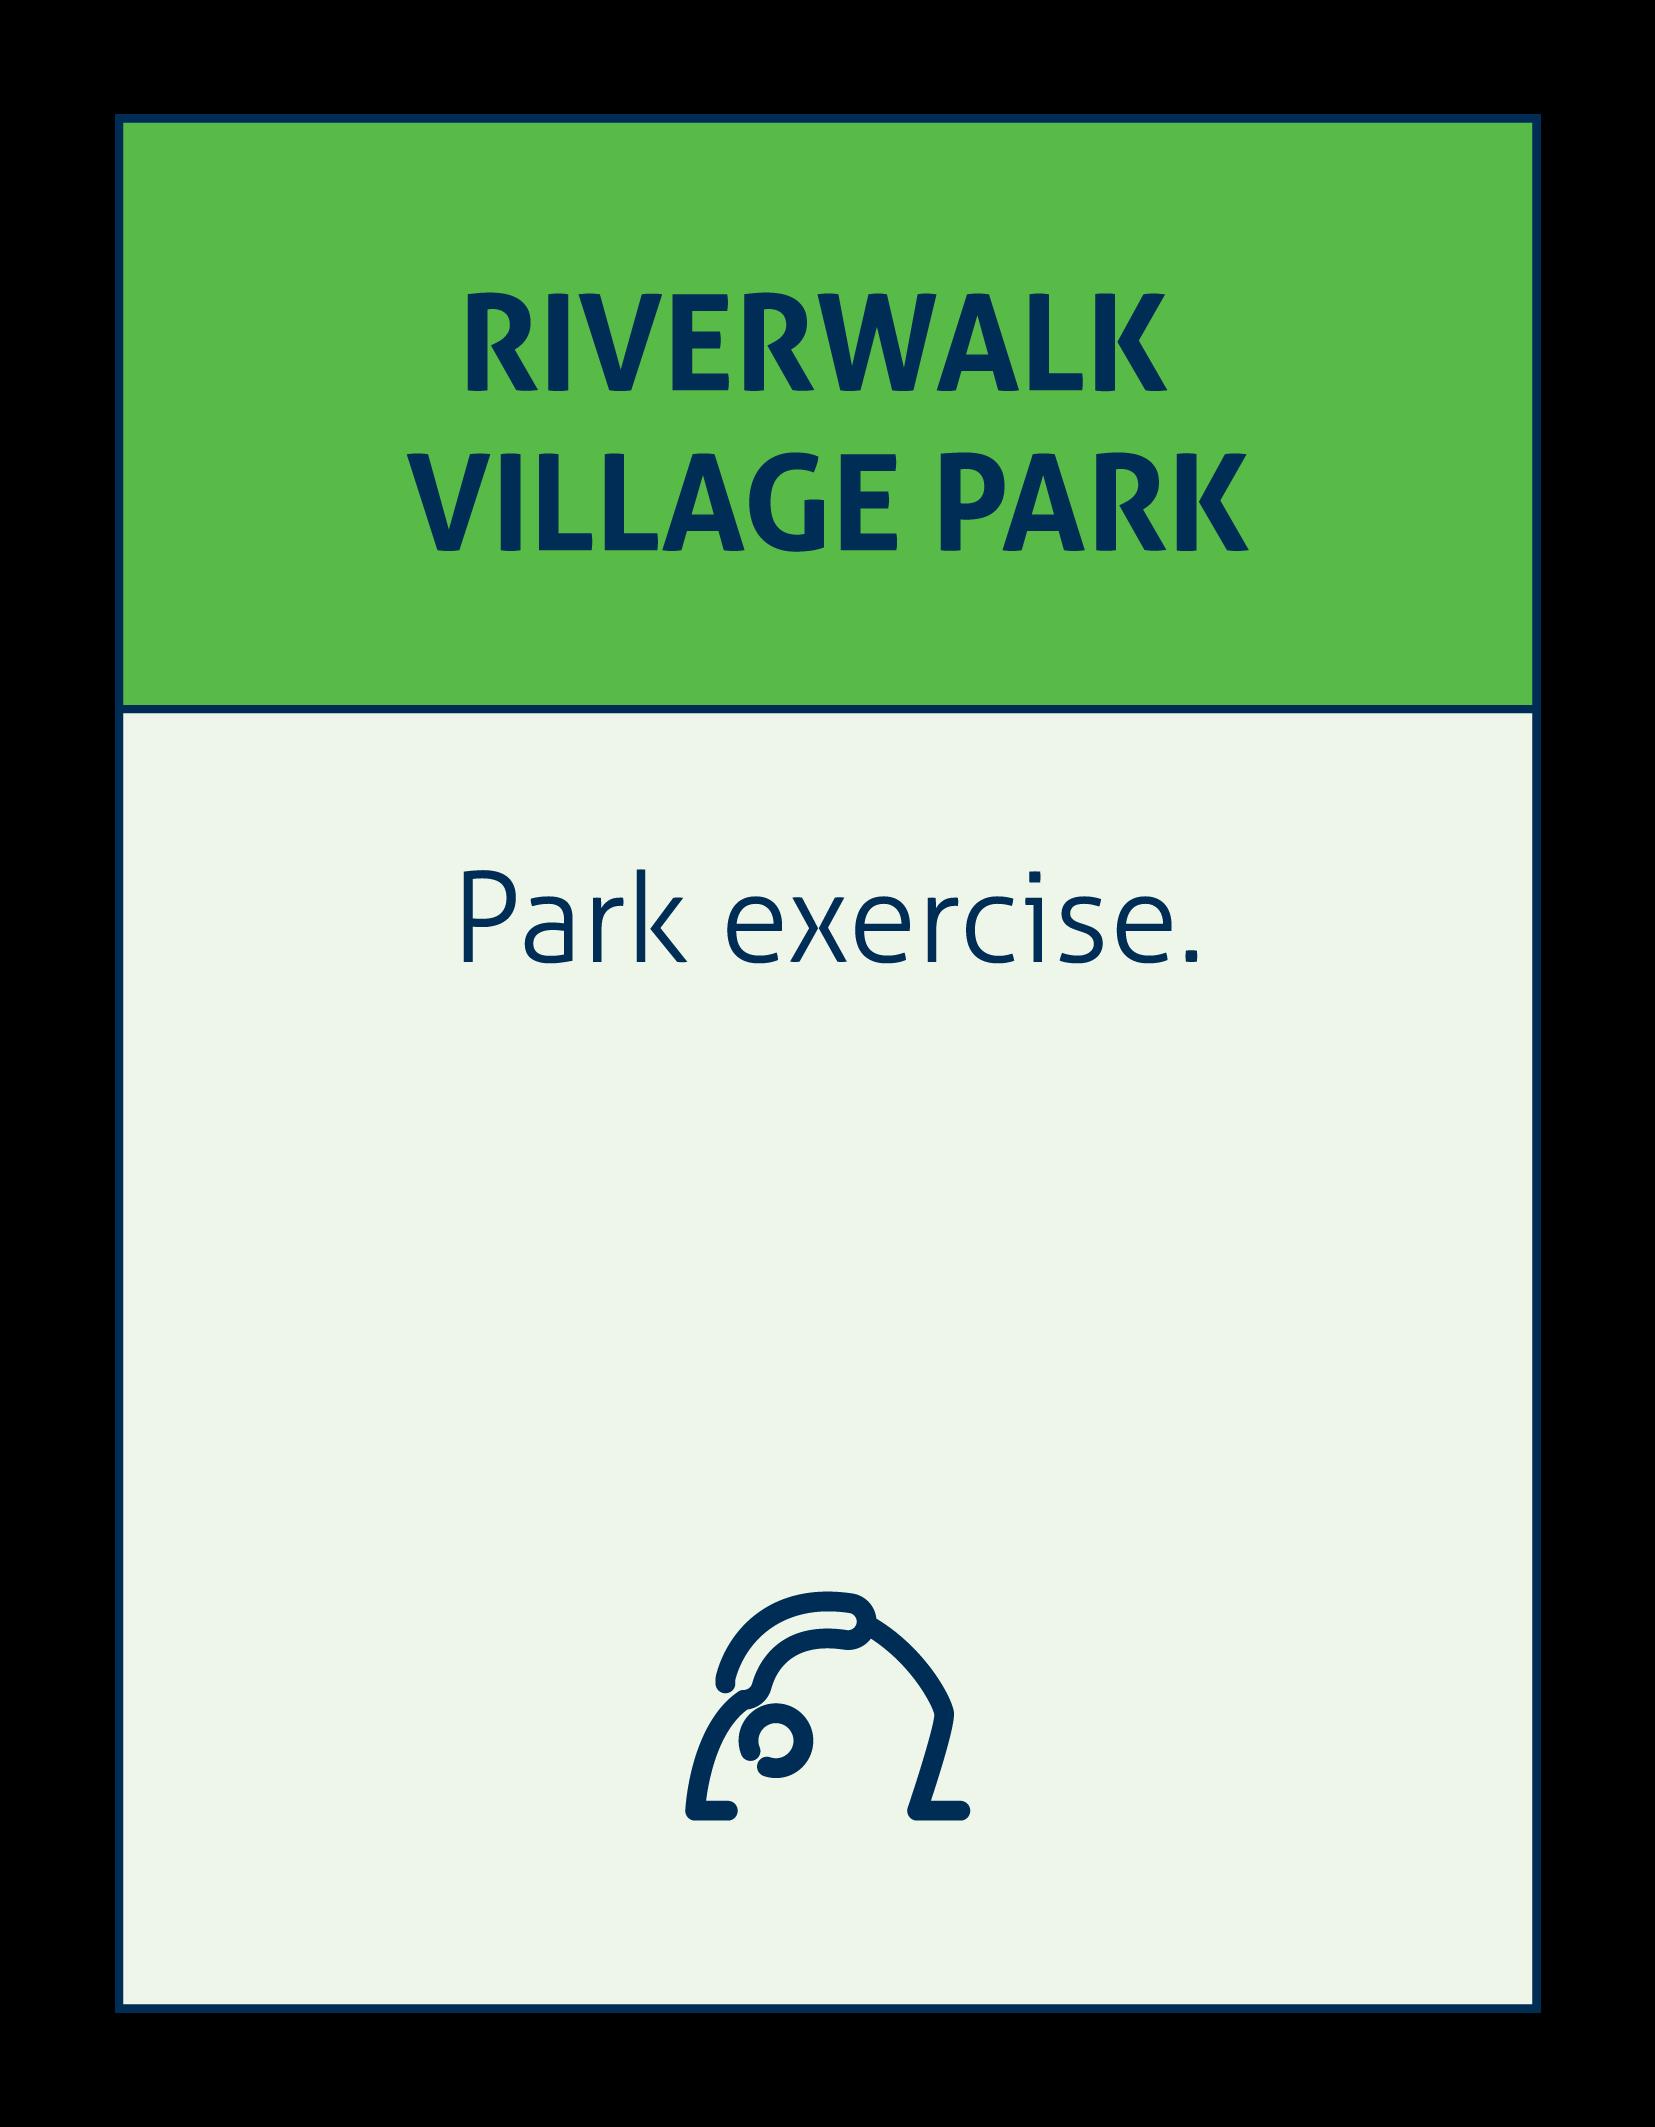 WLS0081_WynaOpoly_Board_IndividualSquares_v1_RiverwalkVillagePark[1]